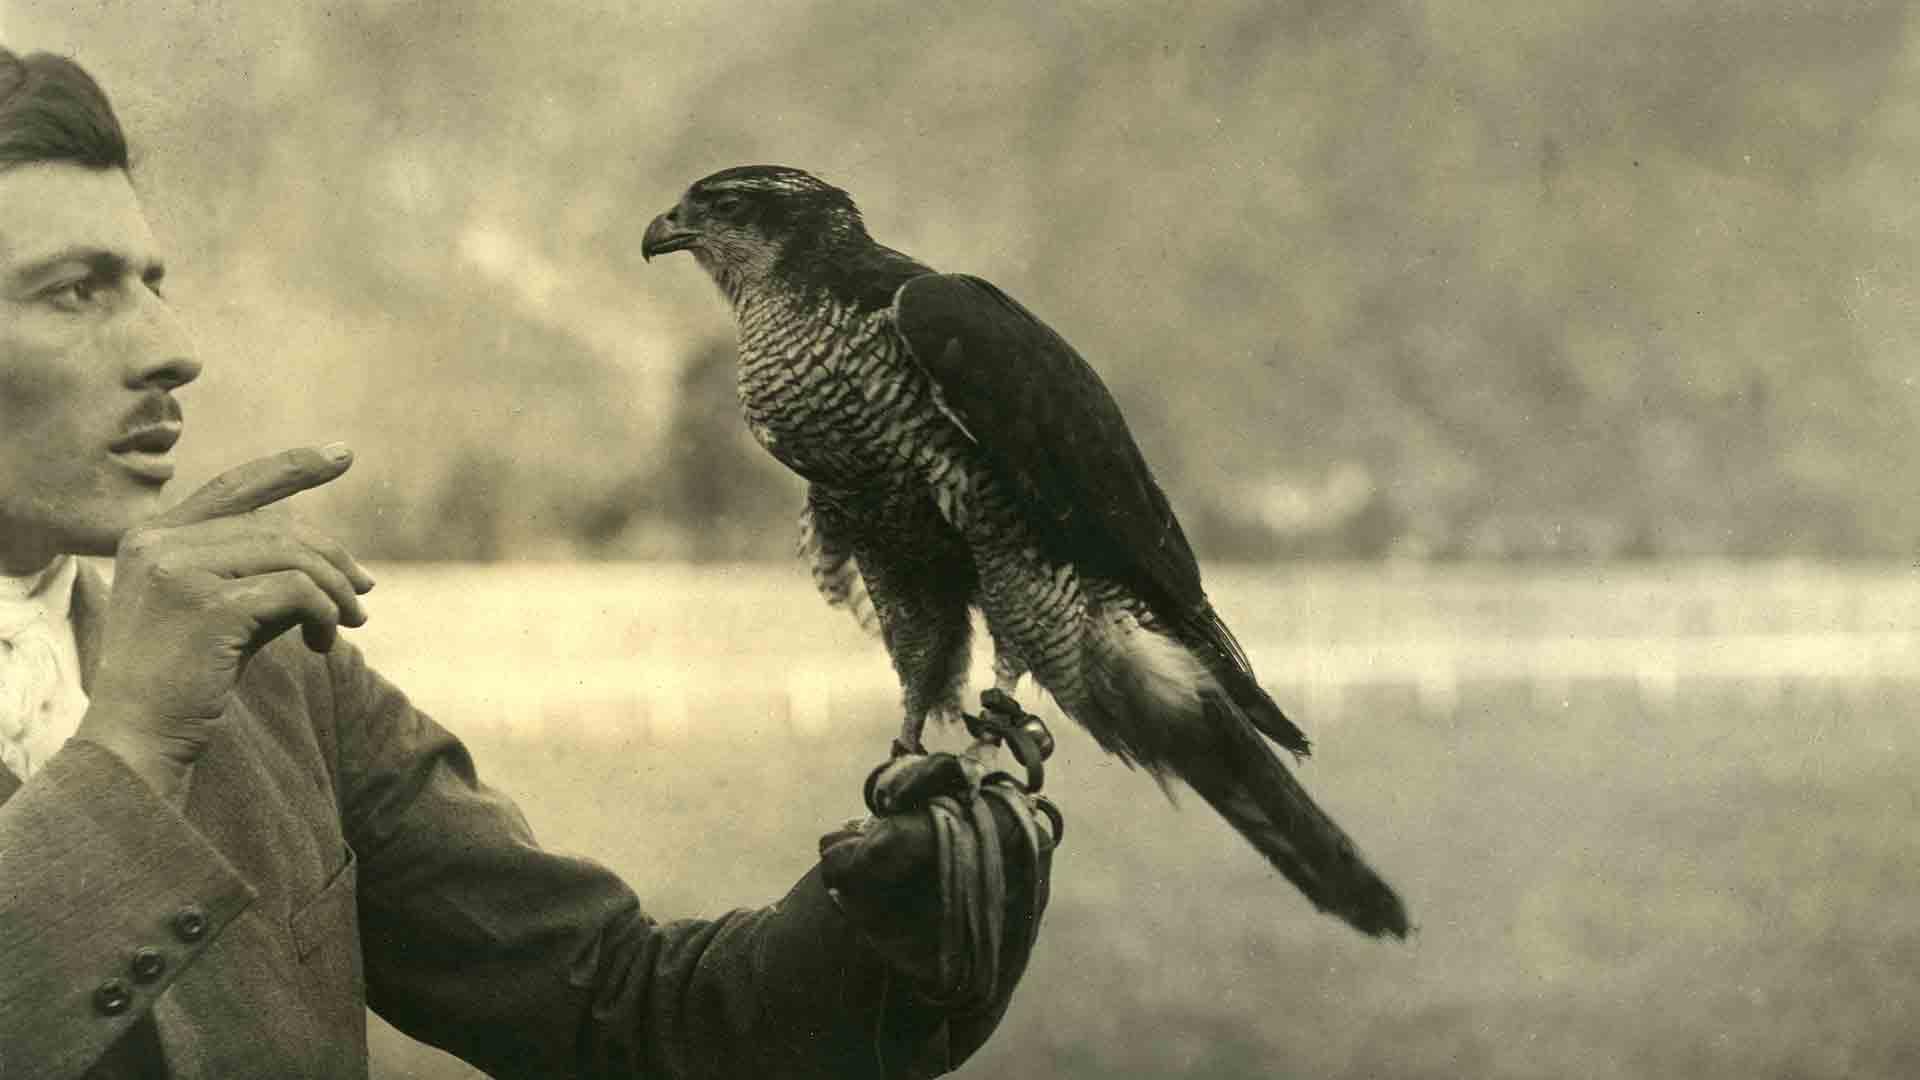 Hawker with his bird of prey.